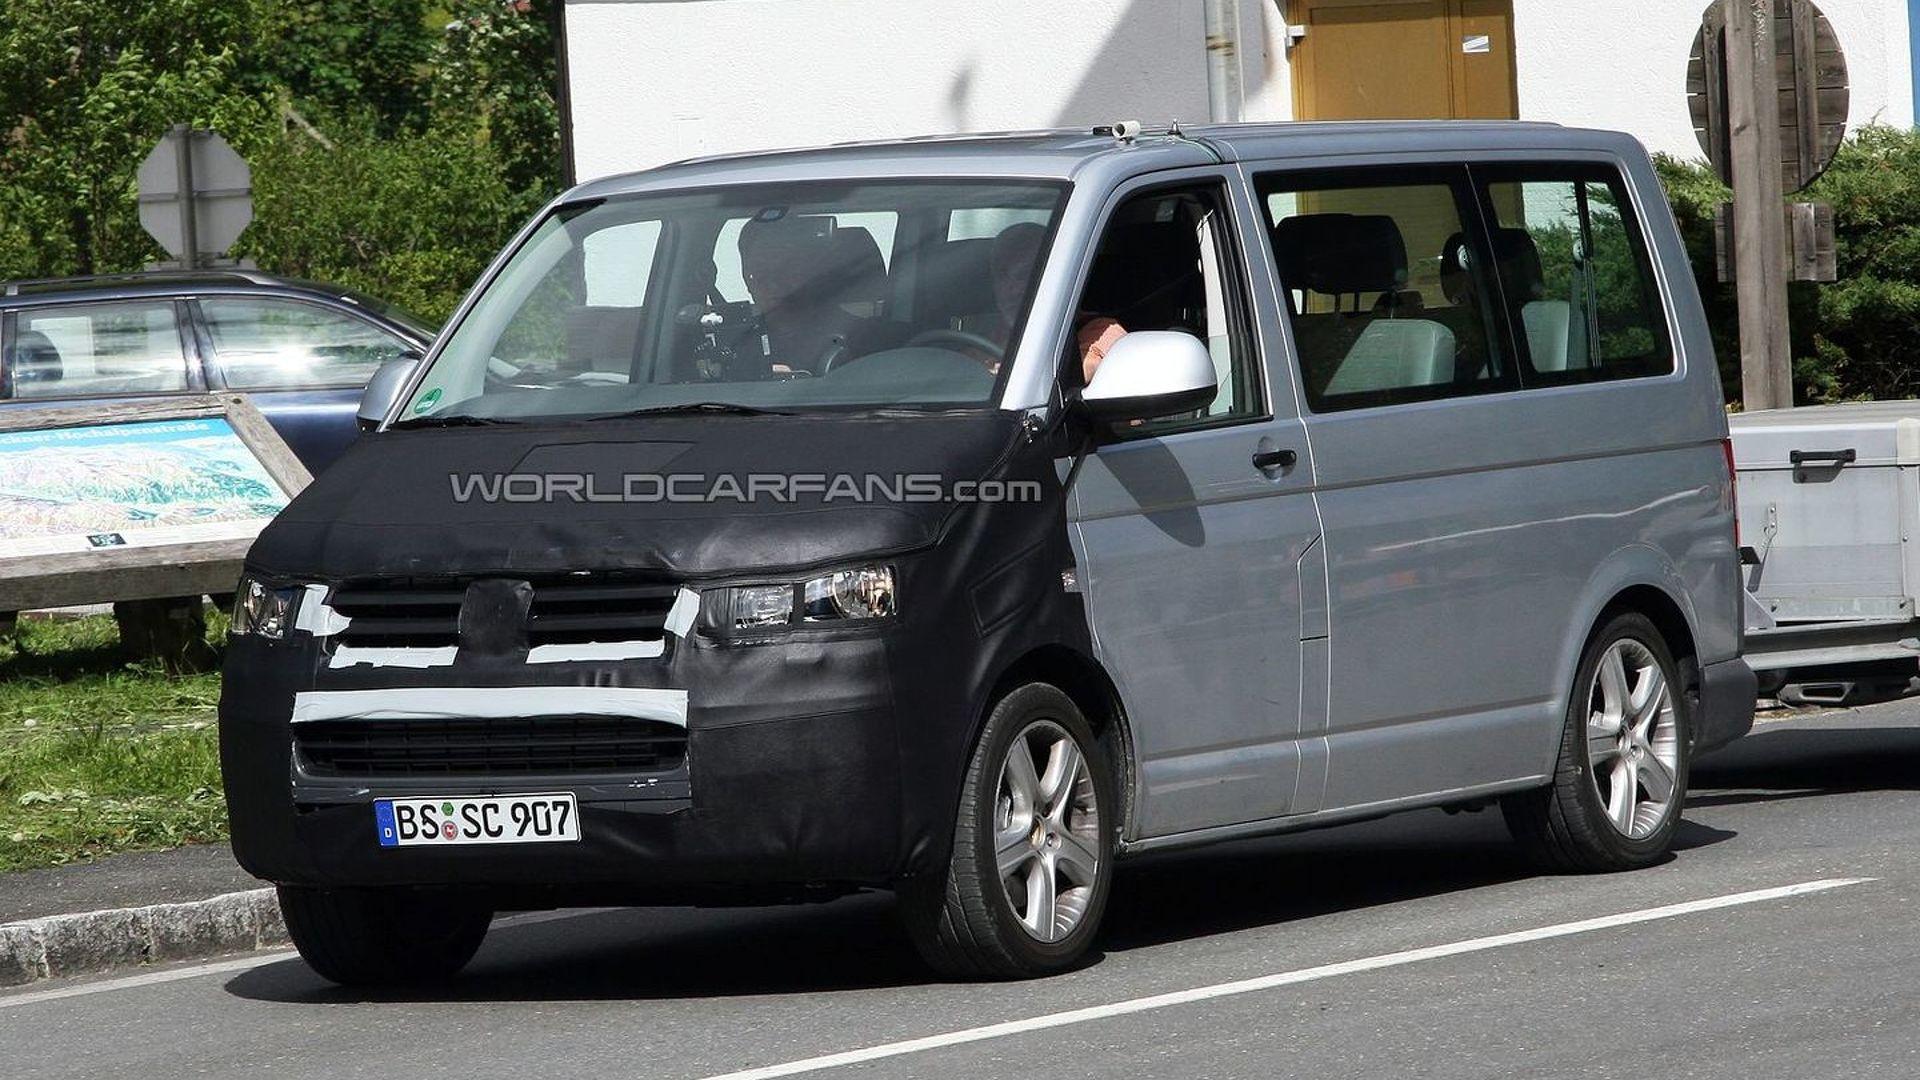 Volkswagen T5 Facelift Caught Testing